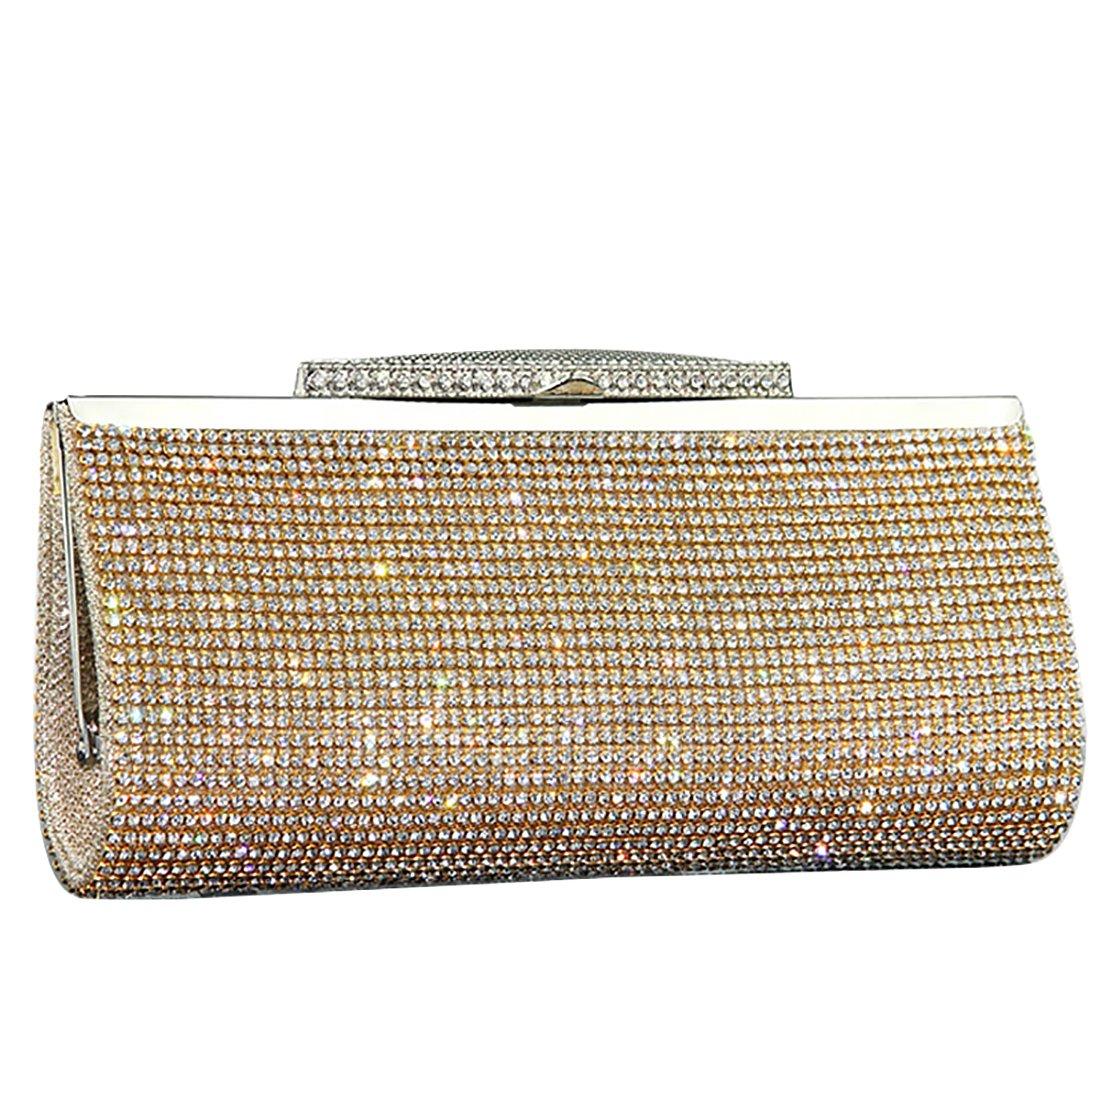 IBELLA Womens Glitter Sequin Clutch Bag Crystal Diamante Sparkly Silver Gold Black Evening Bridal Prom Party Handbag Purse (Gold)